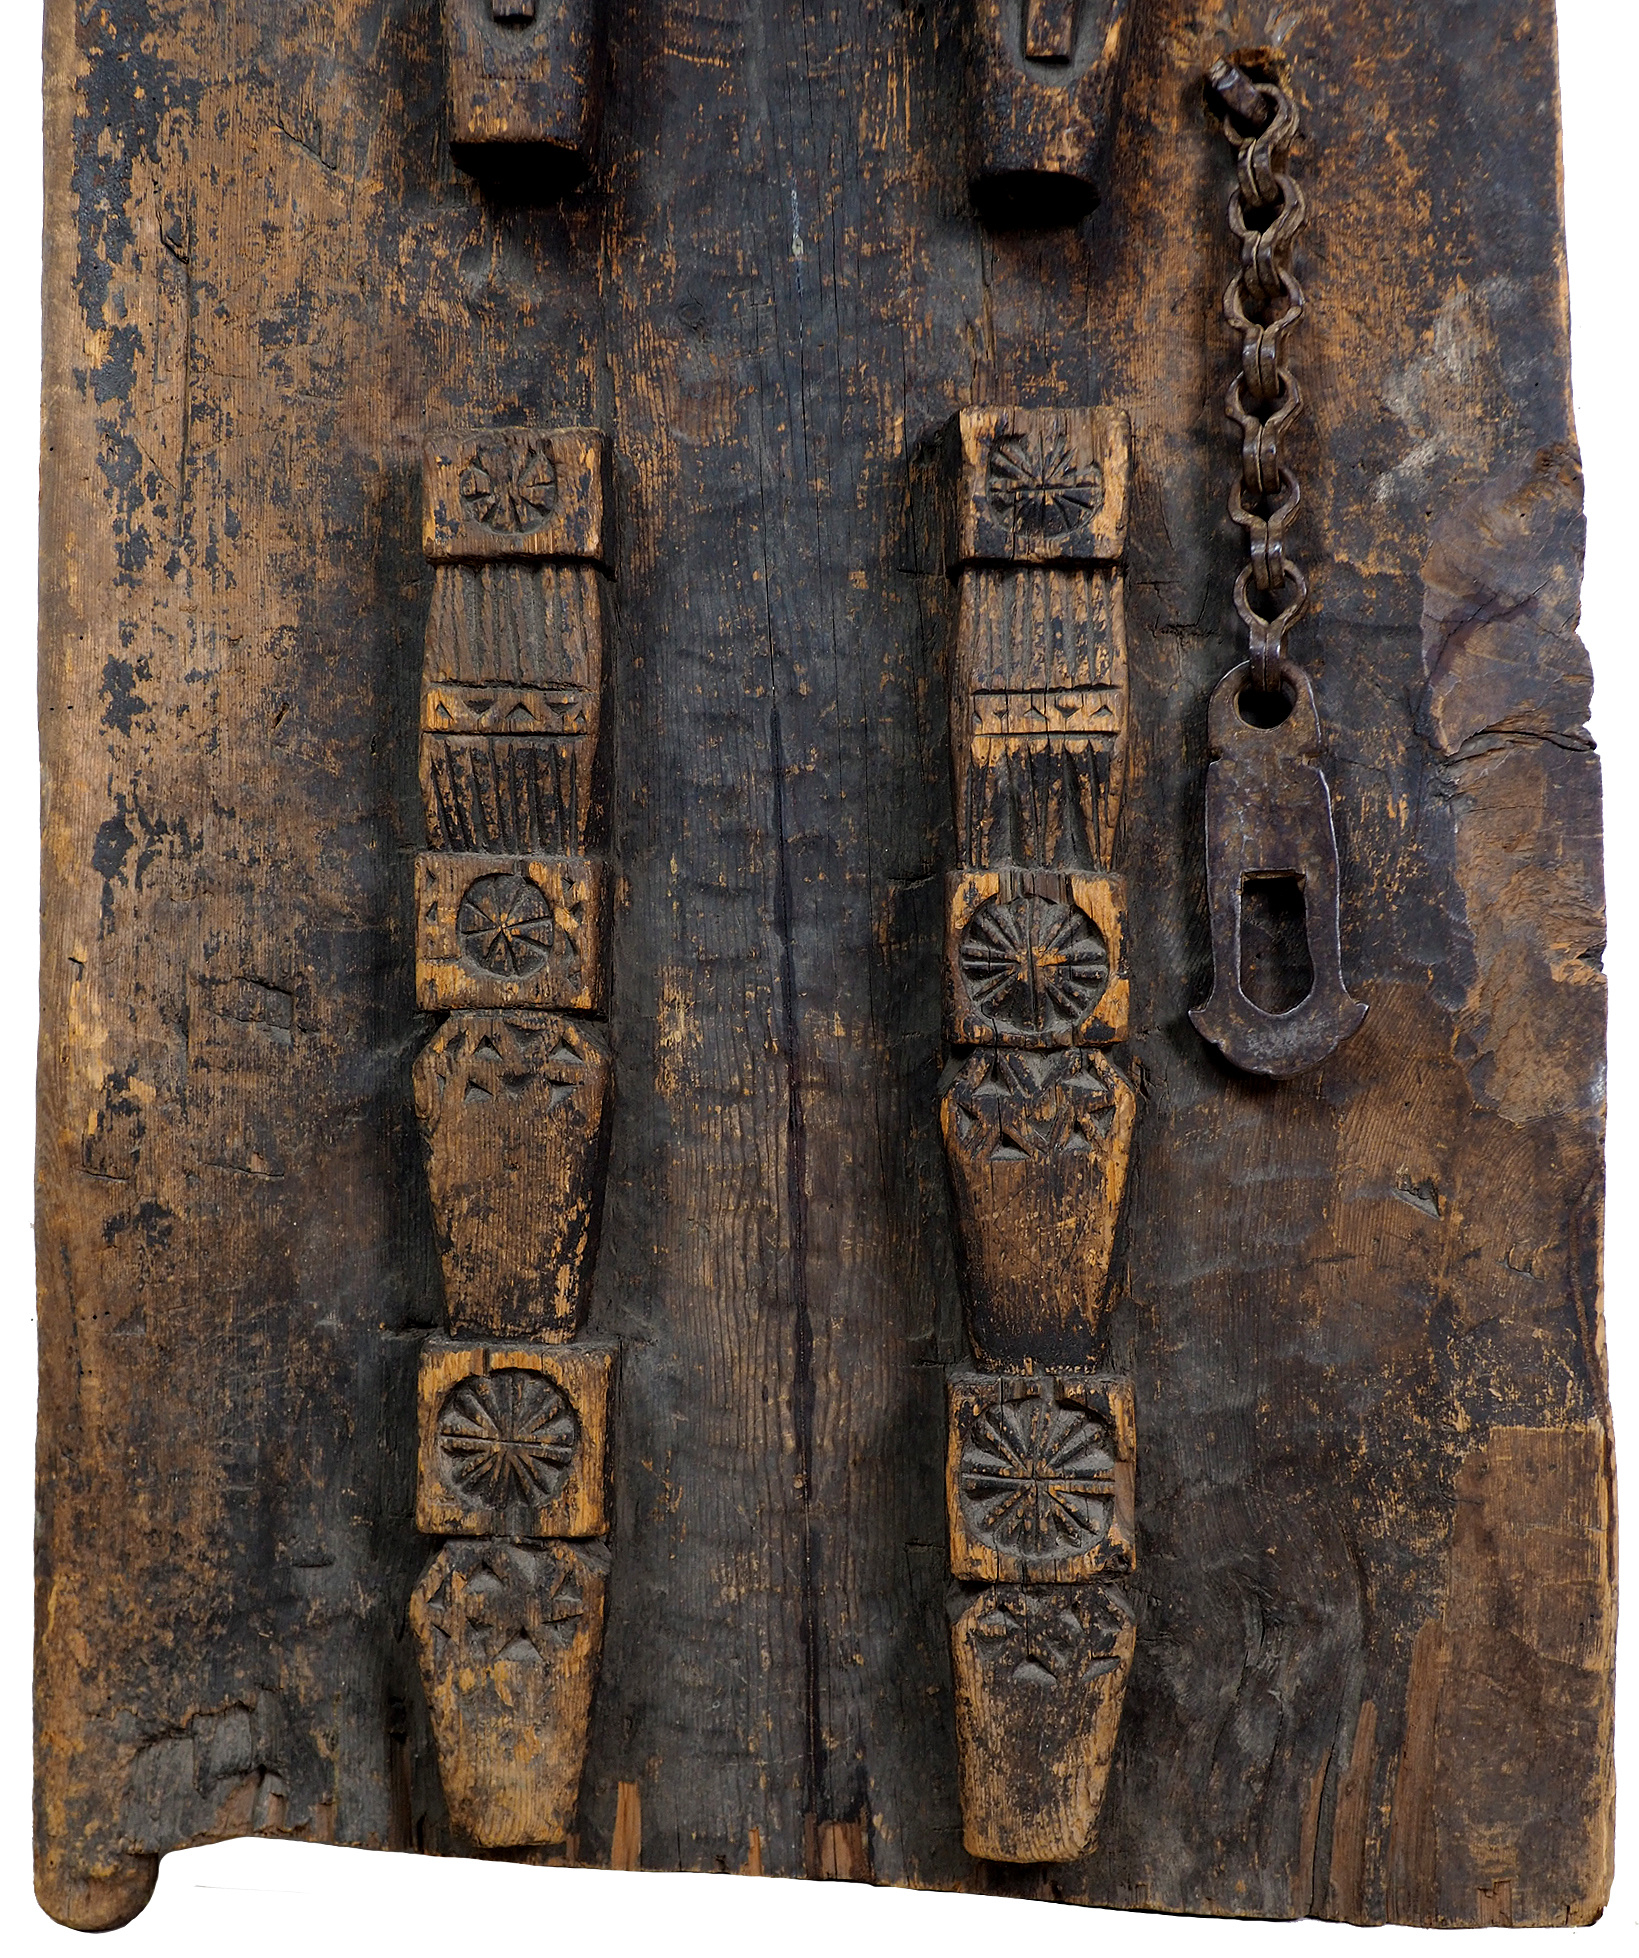 antik orient Massiv Holz Haustür Tür türplatte zimmertür Afghanistan Nuristan Pakistan Swat-Valley 19 Jh. Nr:19/A  - Copy